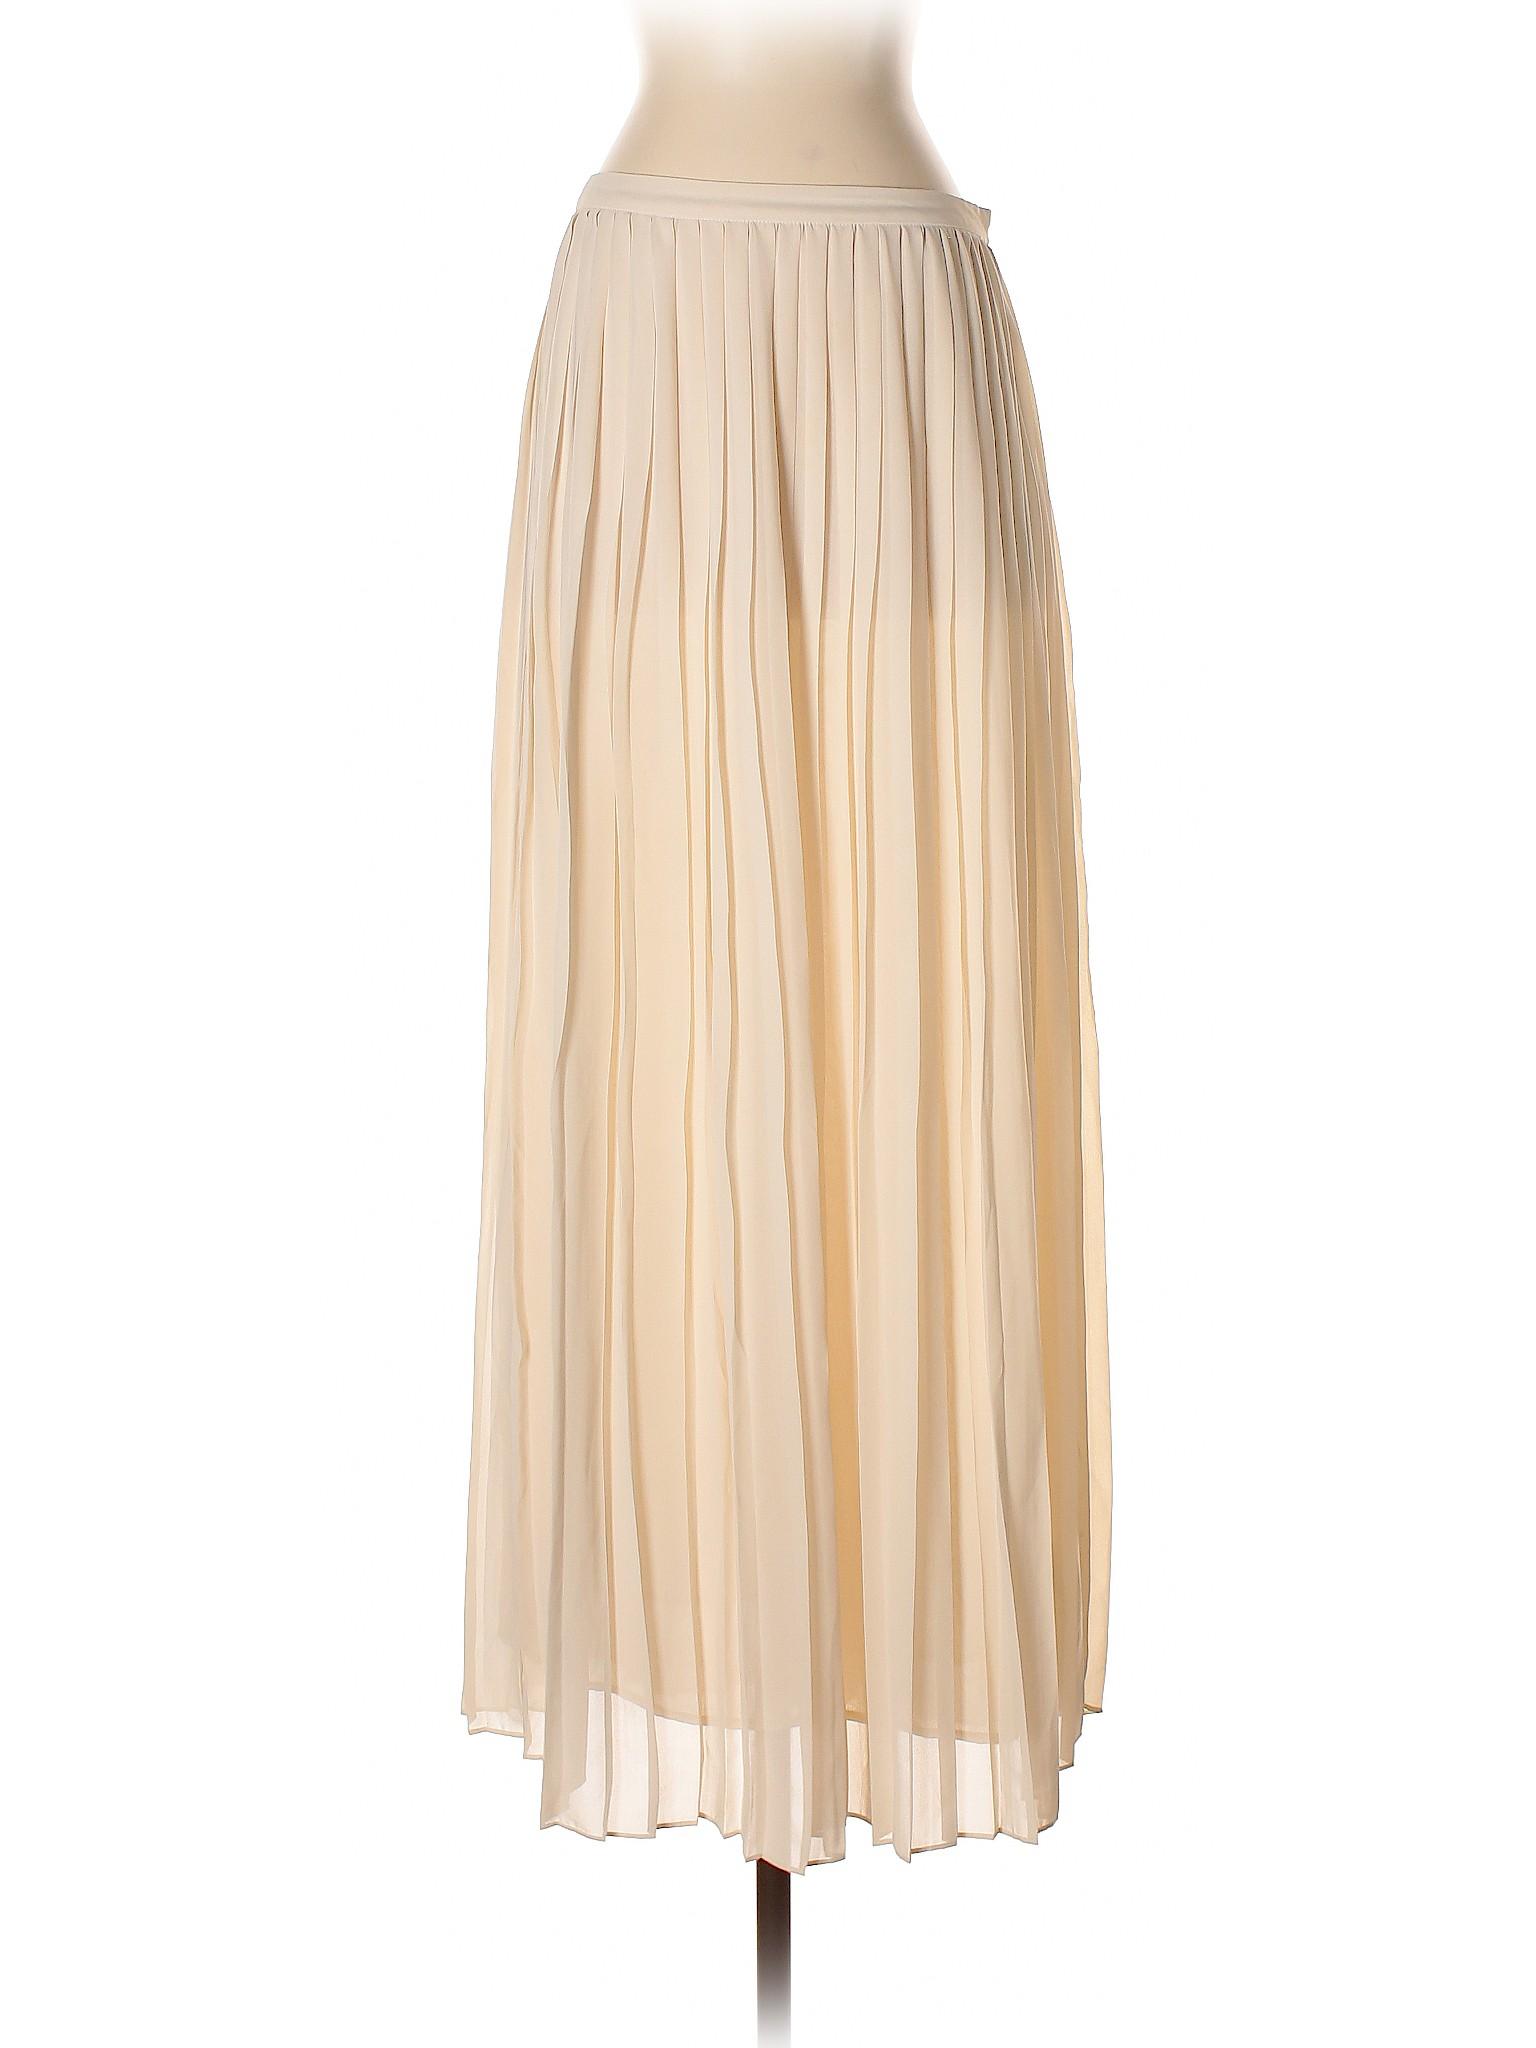 Casual Casual Skirt Boutique Boutique Boutique Boutique Boutique Skirt Skirt Skirt Casual Casual Casual Boutique Skirt Tqw4A84